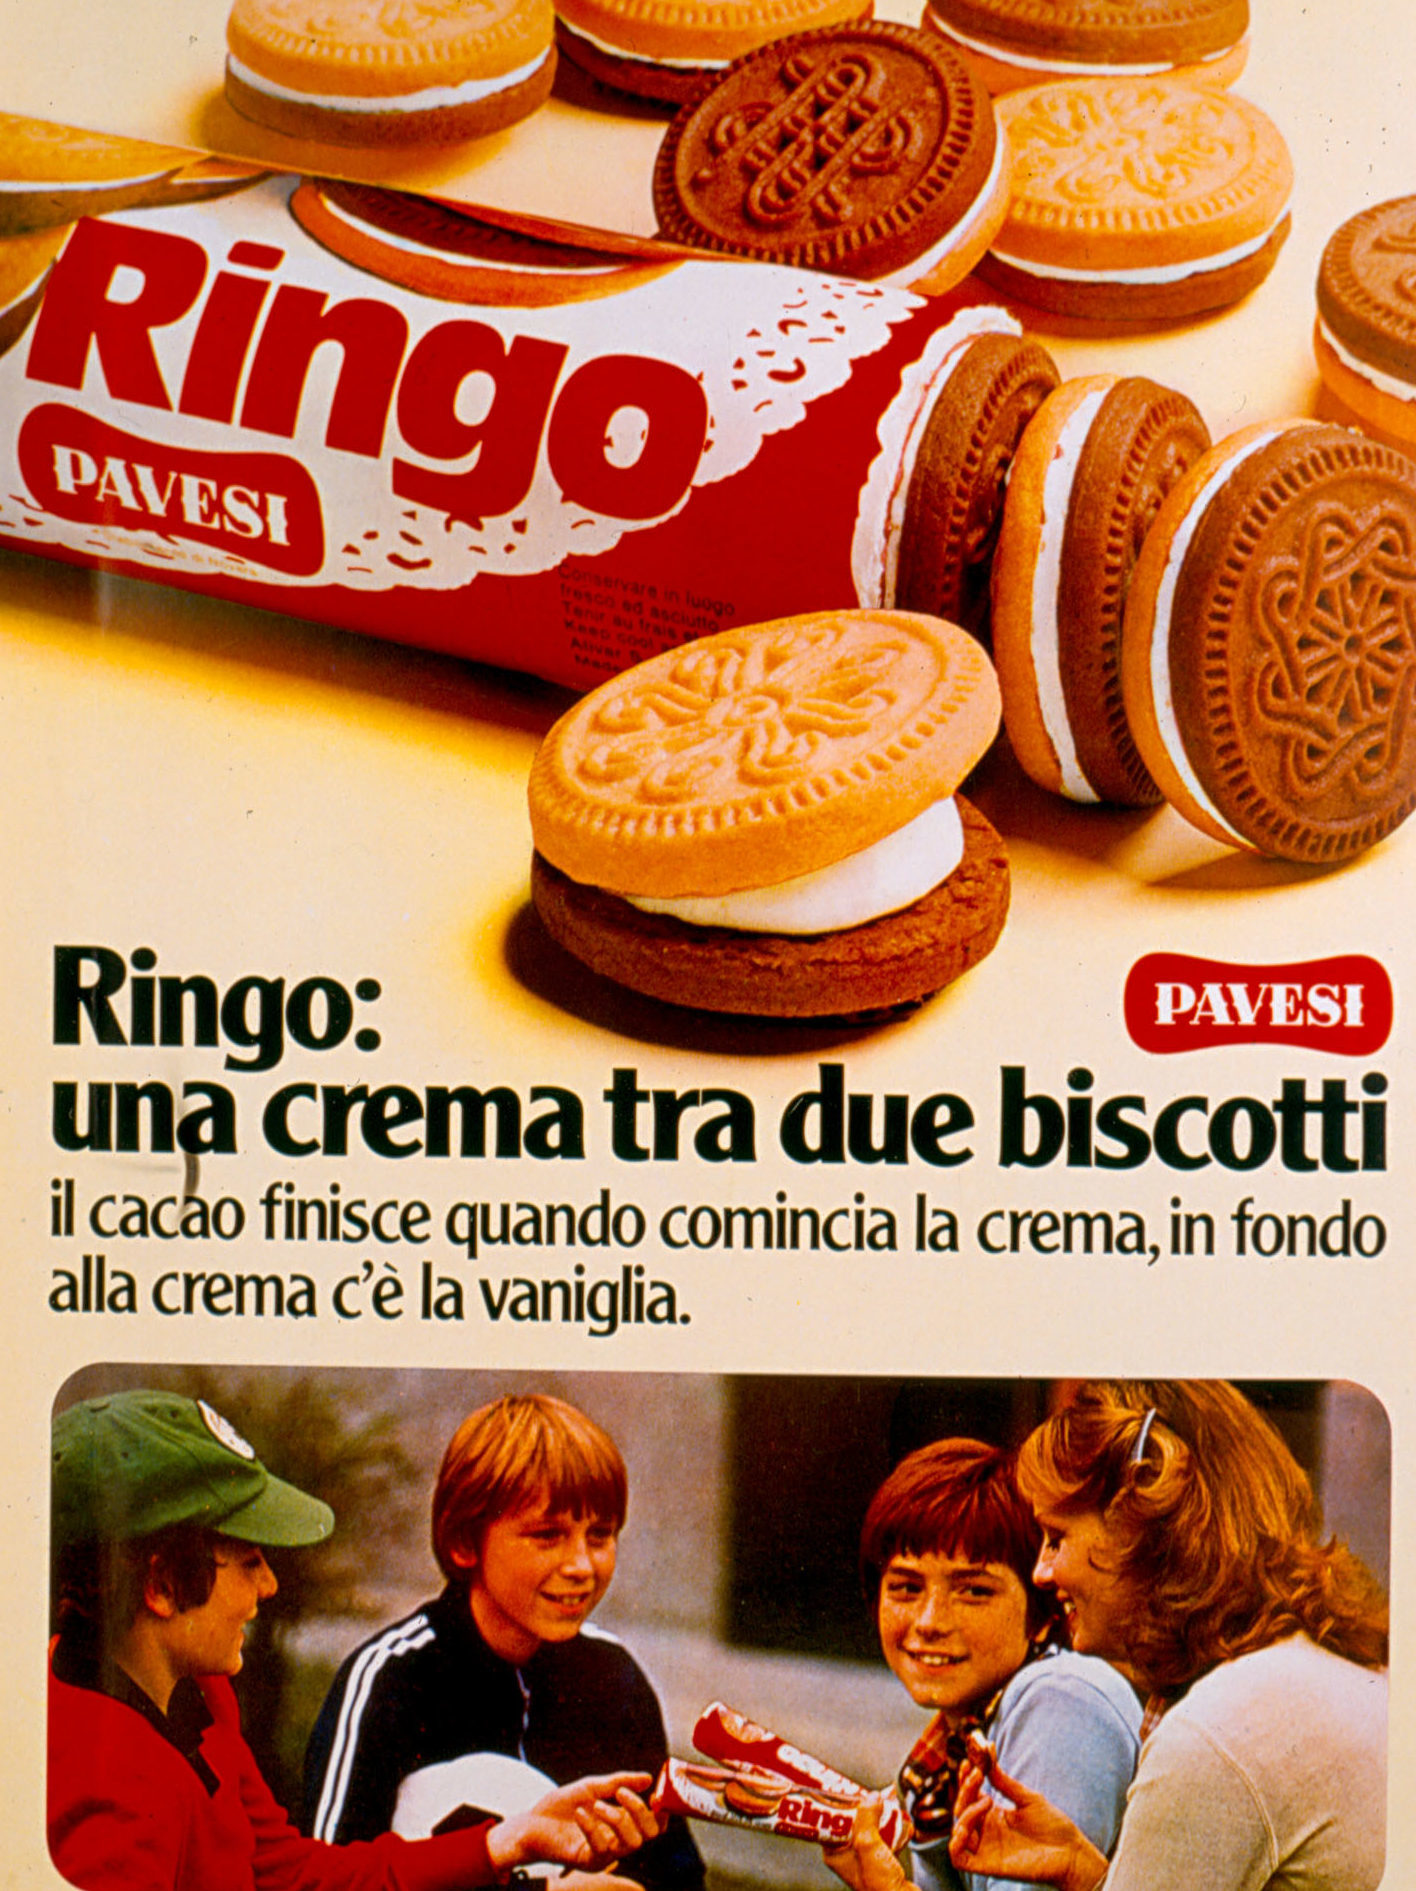 Press advertising - Ringo, una crema tra due biscotti, 1977 [Ringo, cream between two biscuits, 1977]